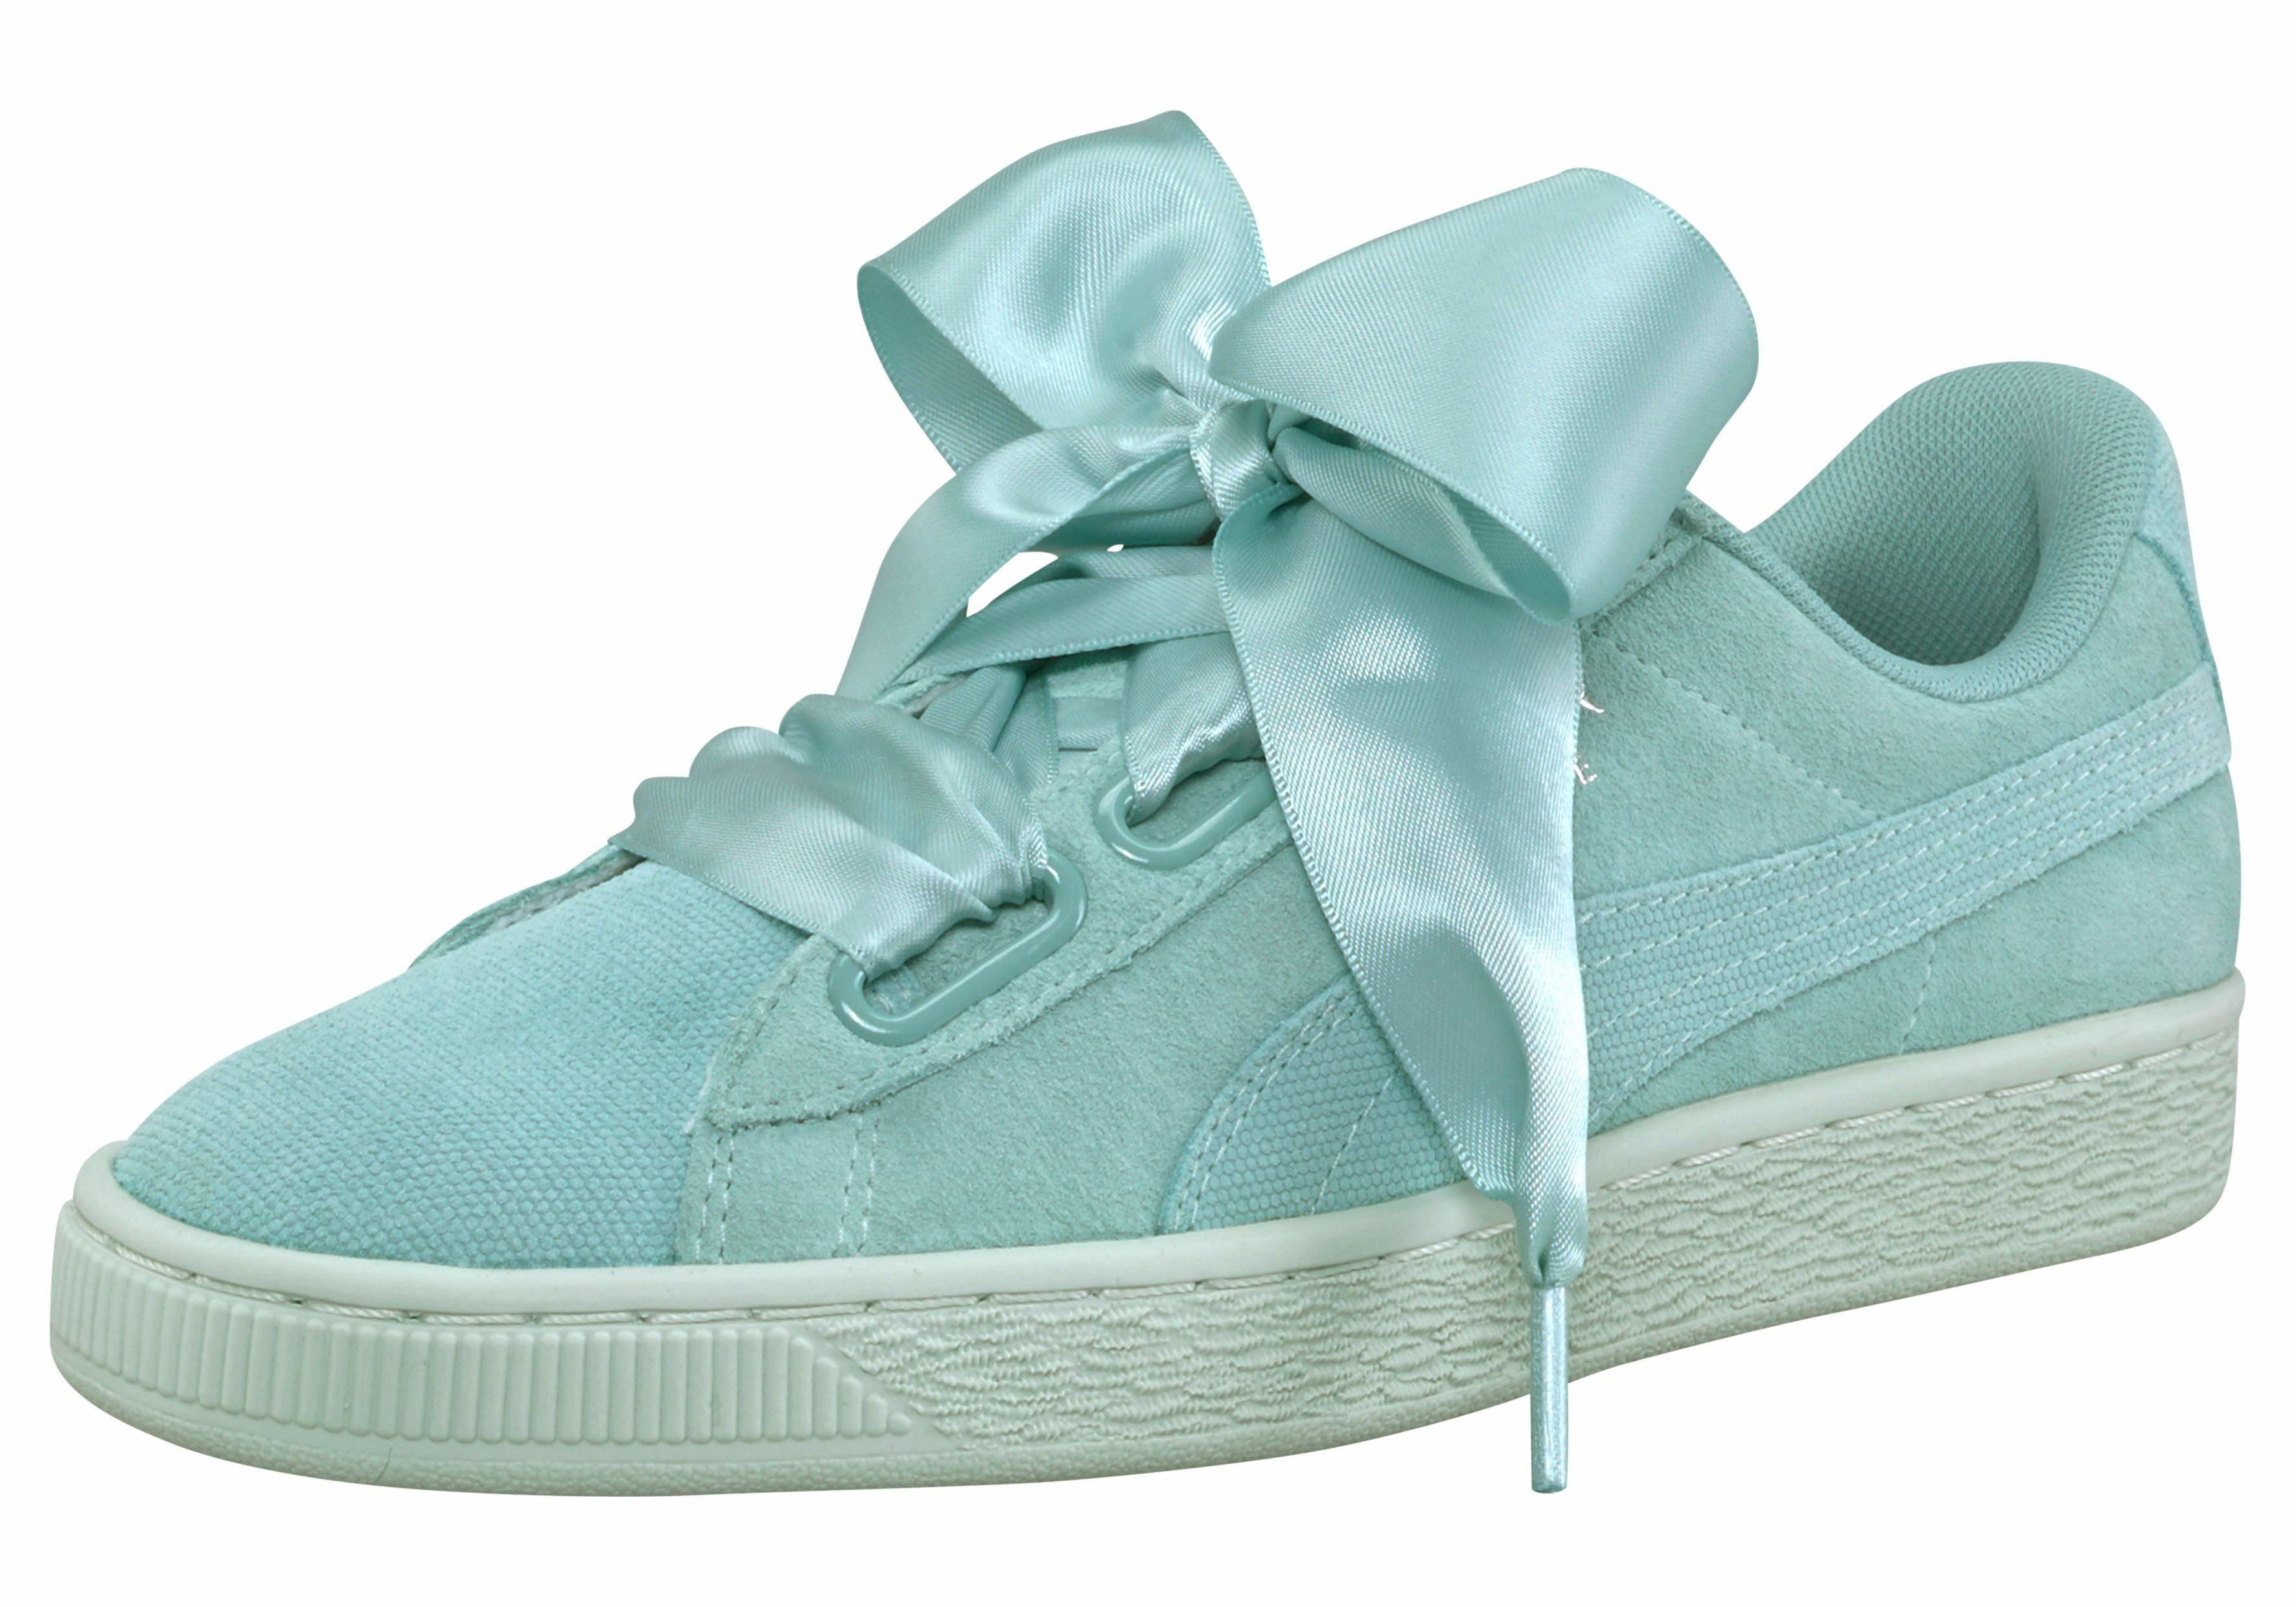 PUMA Suede Heart Pebble Womens Sneaker kaufen  aquablau